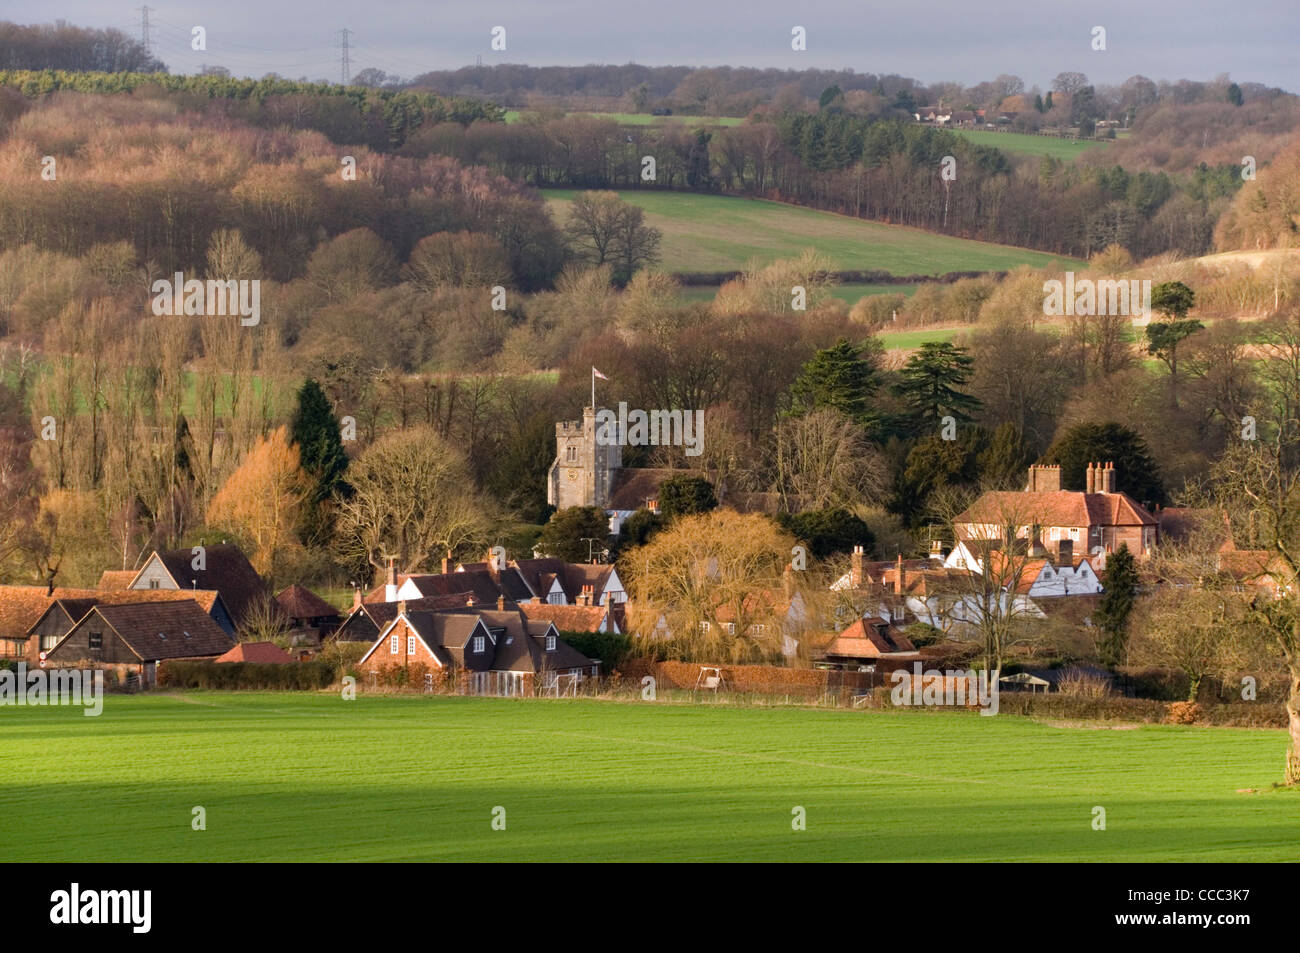 Chiltern Hills - Little Missenden - Buckinghamshire - seen across fields - winter sunlight - late afternoon - Stock Image